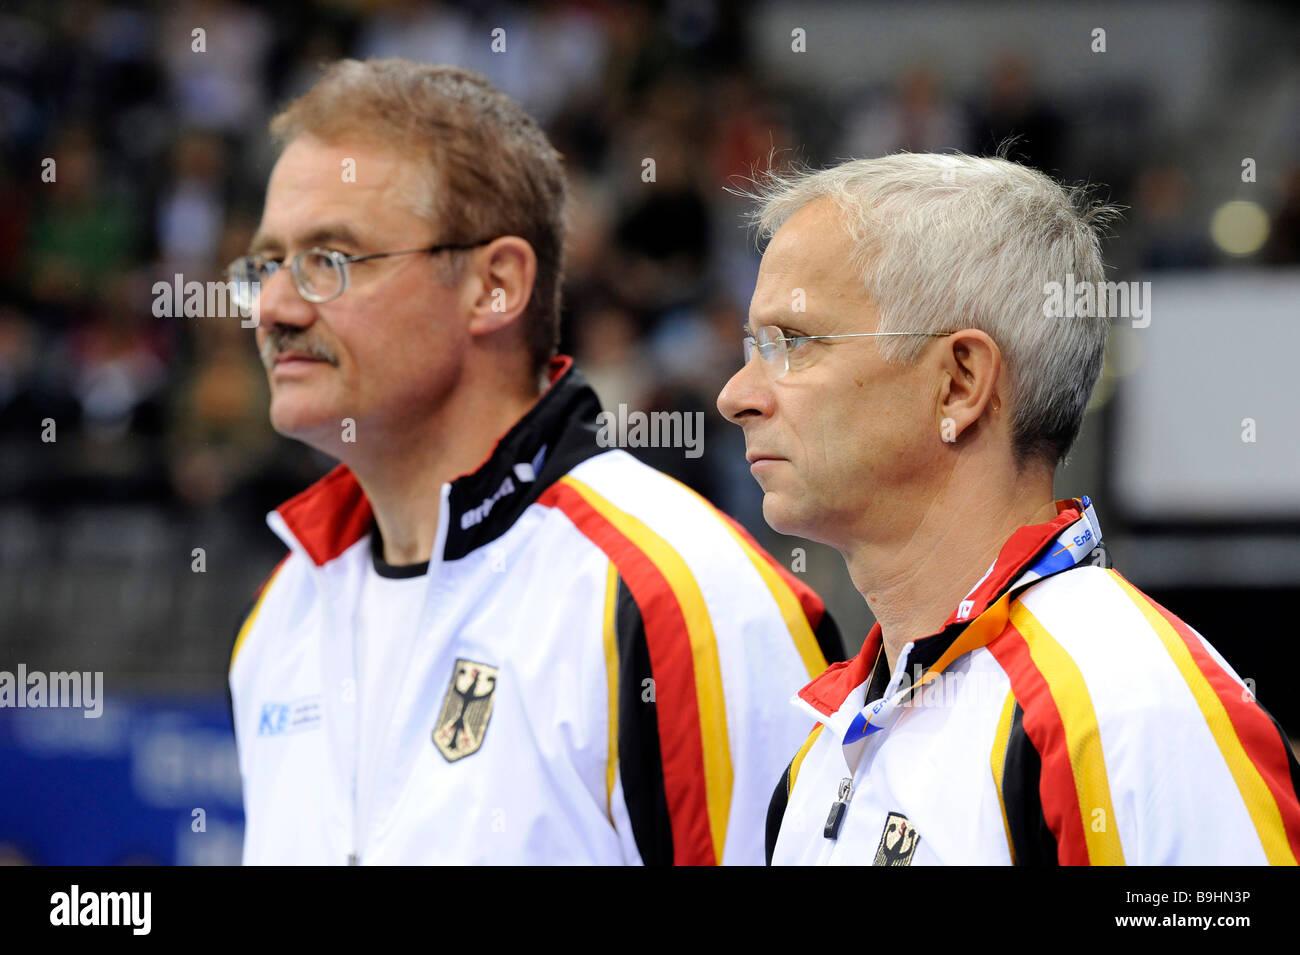 Gymnastics coach Andreas Hirsch, right, and Wolfgang Hambuechen, coach of Fabian Hambuechen, gymnastics world cup - Stock Image